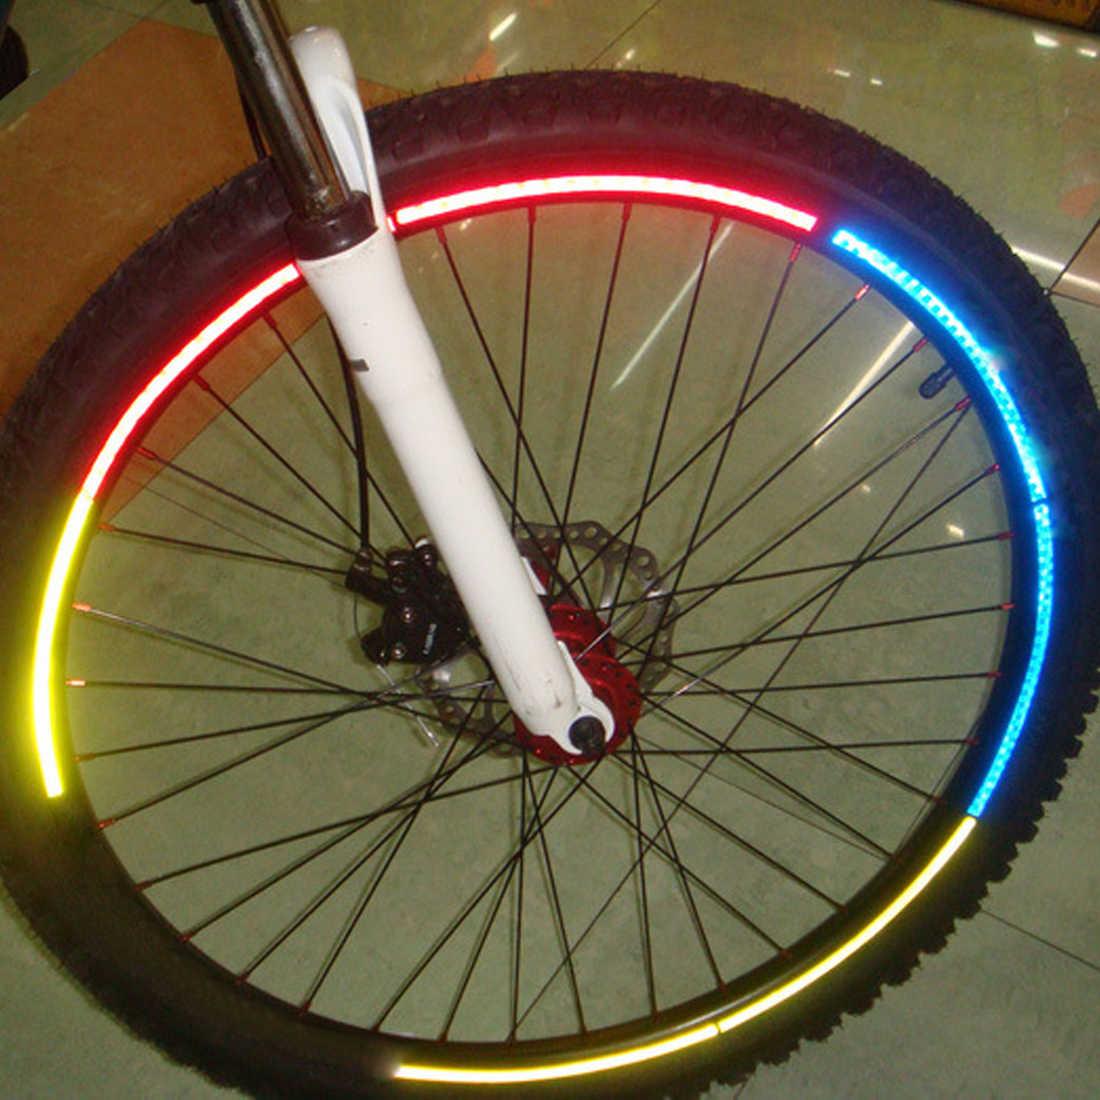 2 PCS เรืองแสงจักรยานจักรยานรถจักรยานยนต์ยางล้อยางสะท้อนแสงแถบสติกเกอร์รูปลอกเทปความปลอดภัย